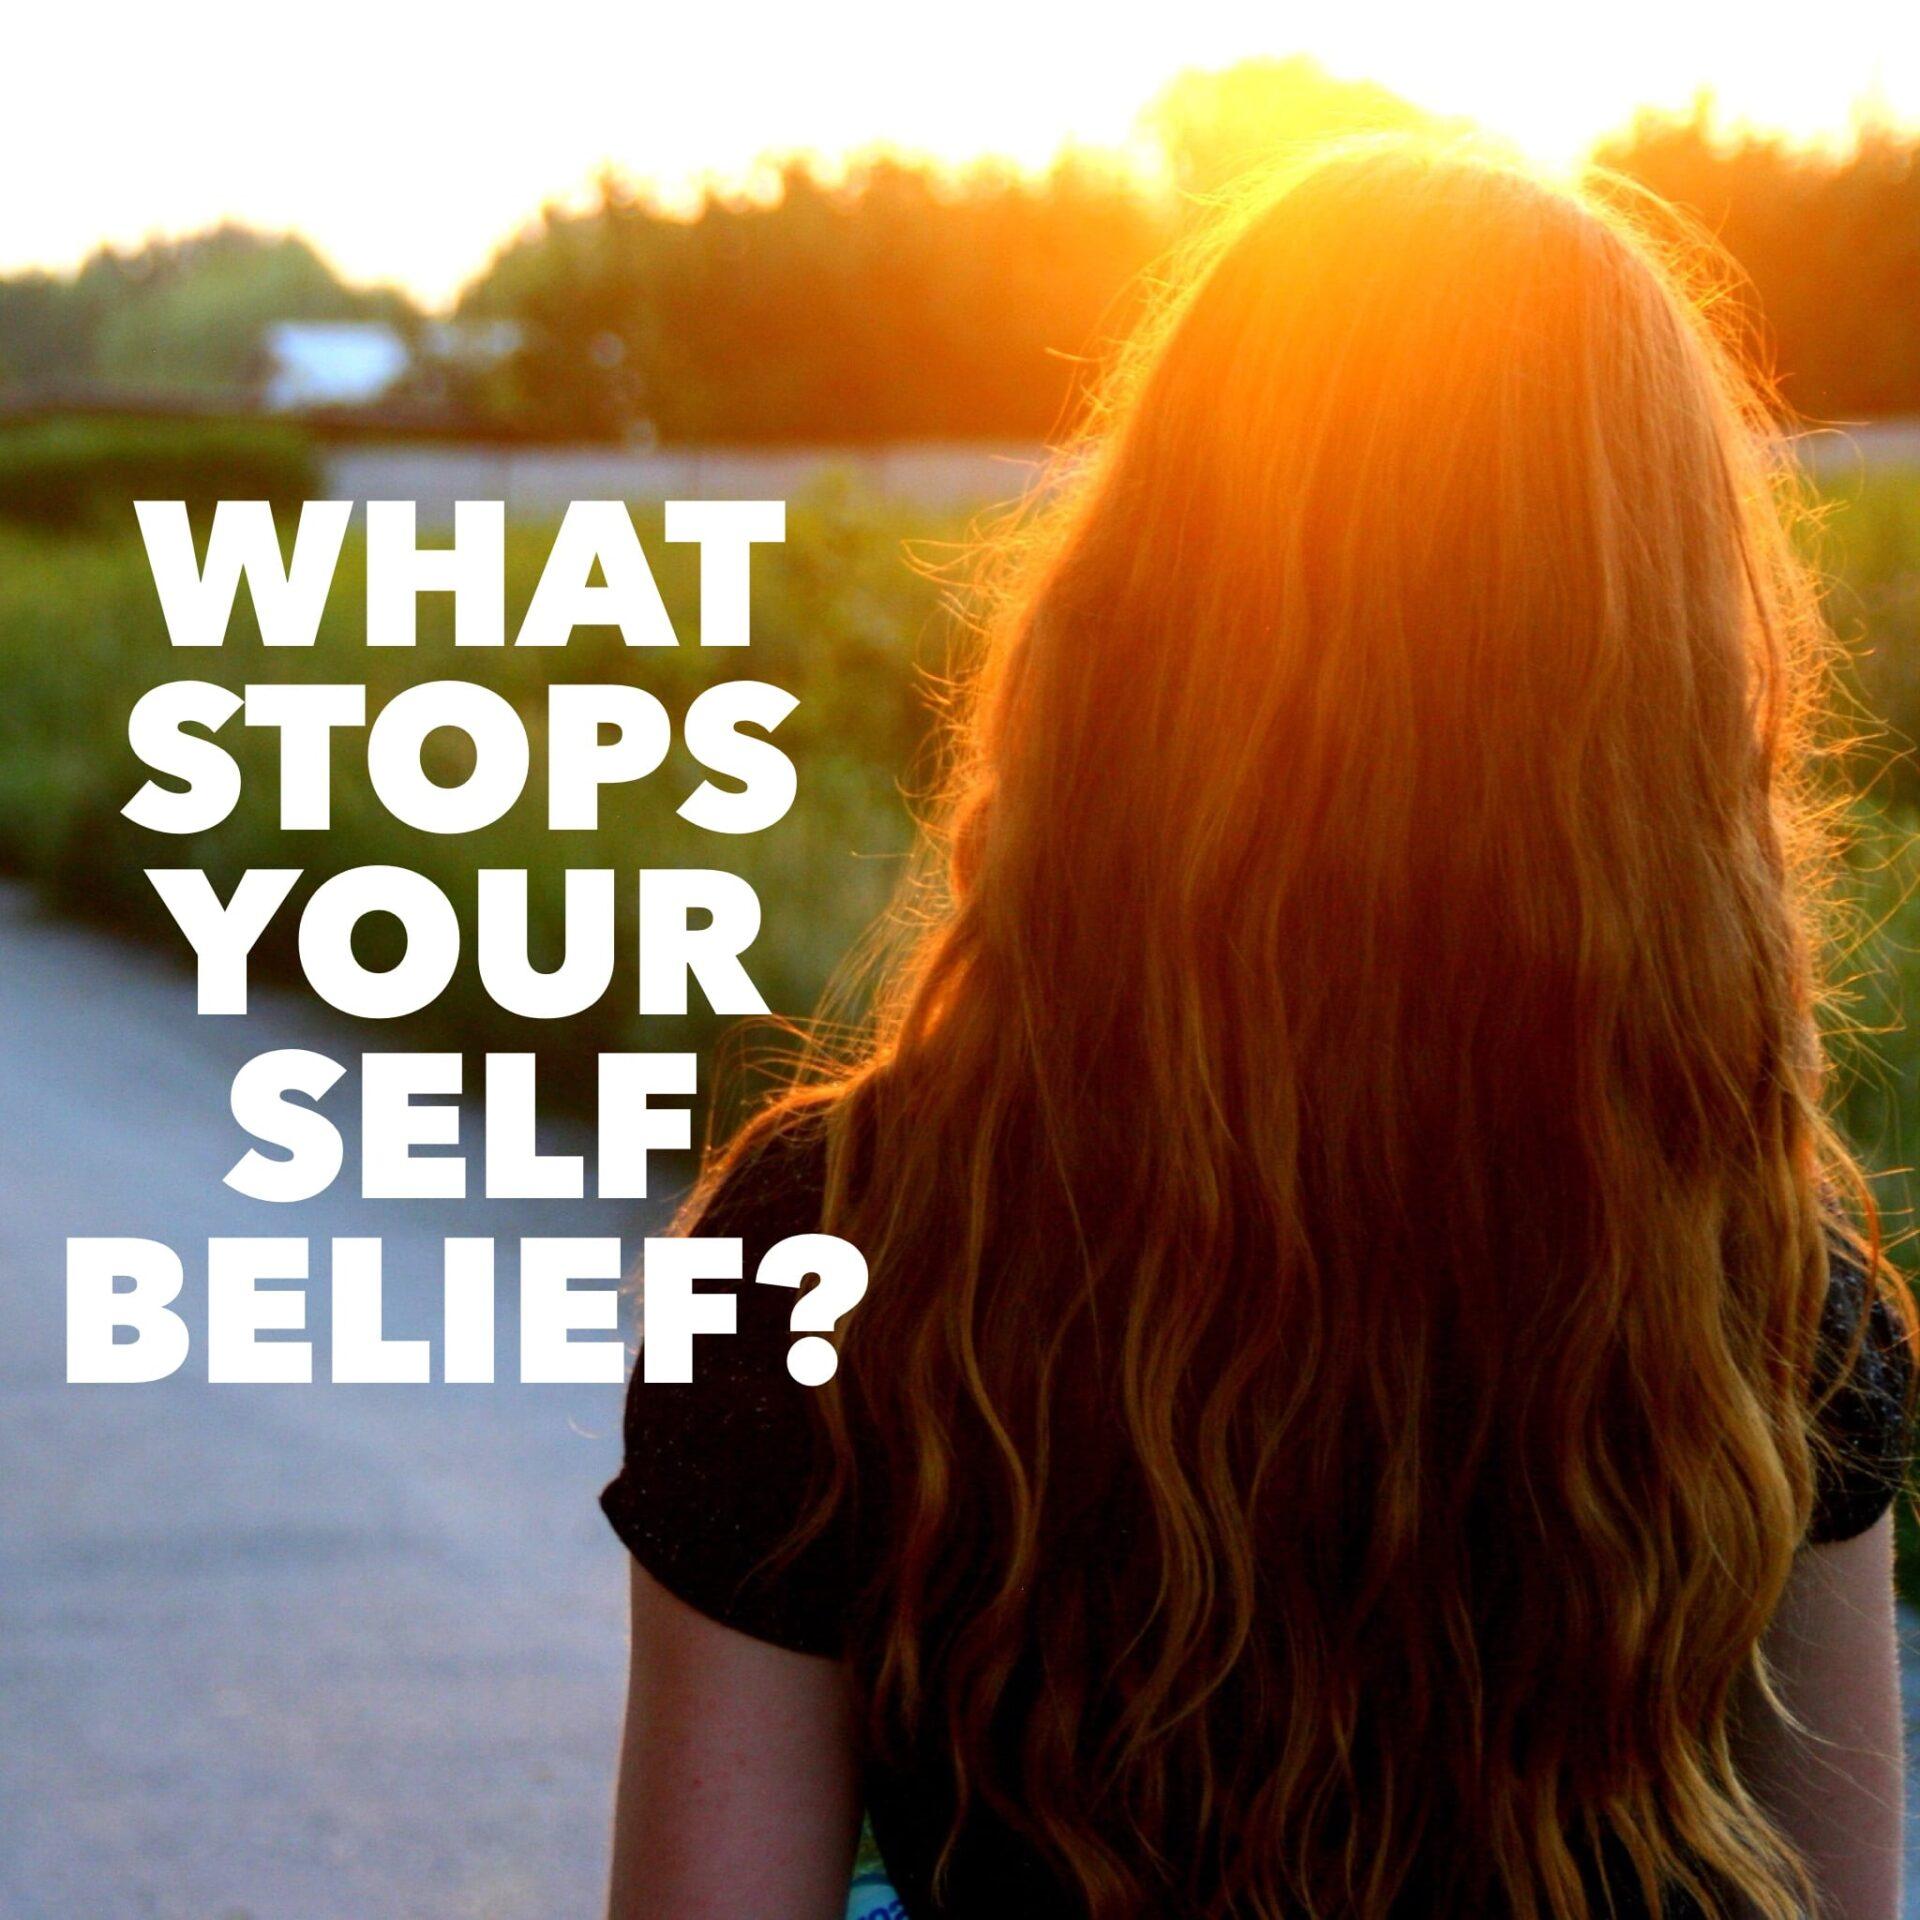 What stops your self-belief?